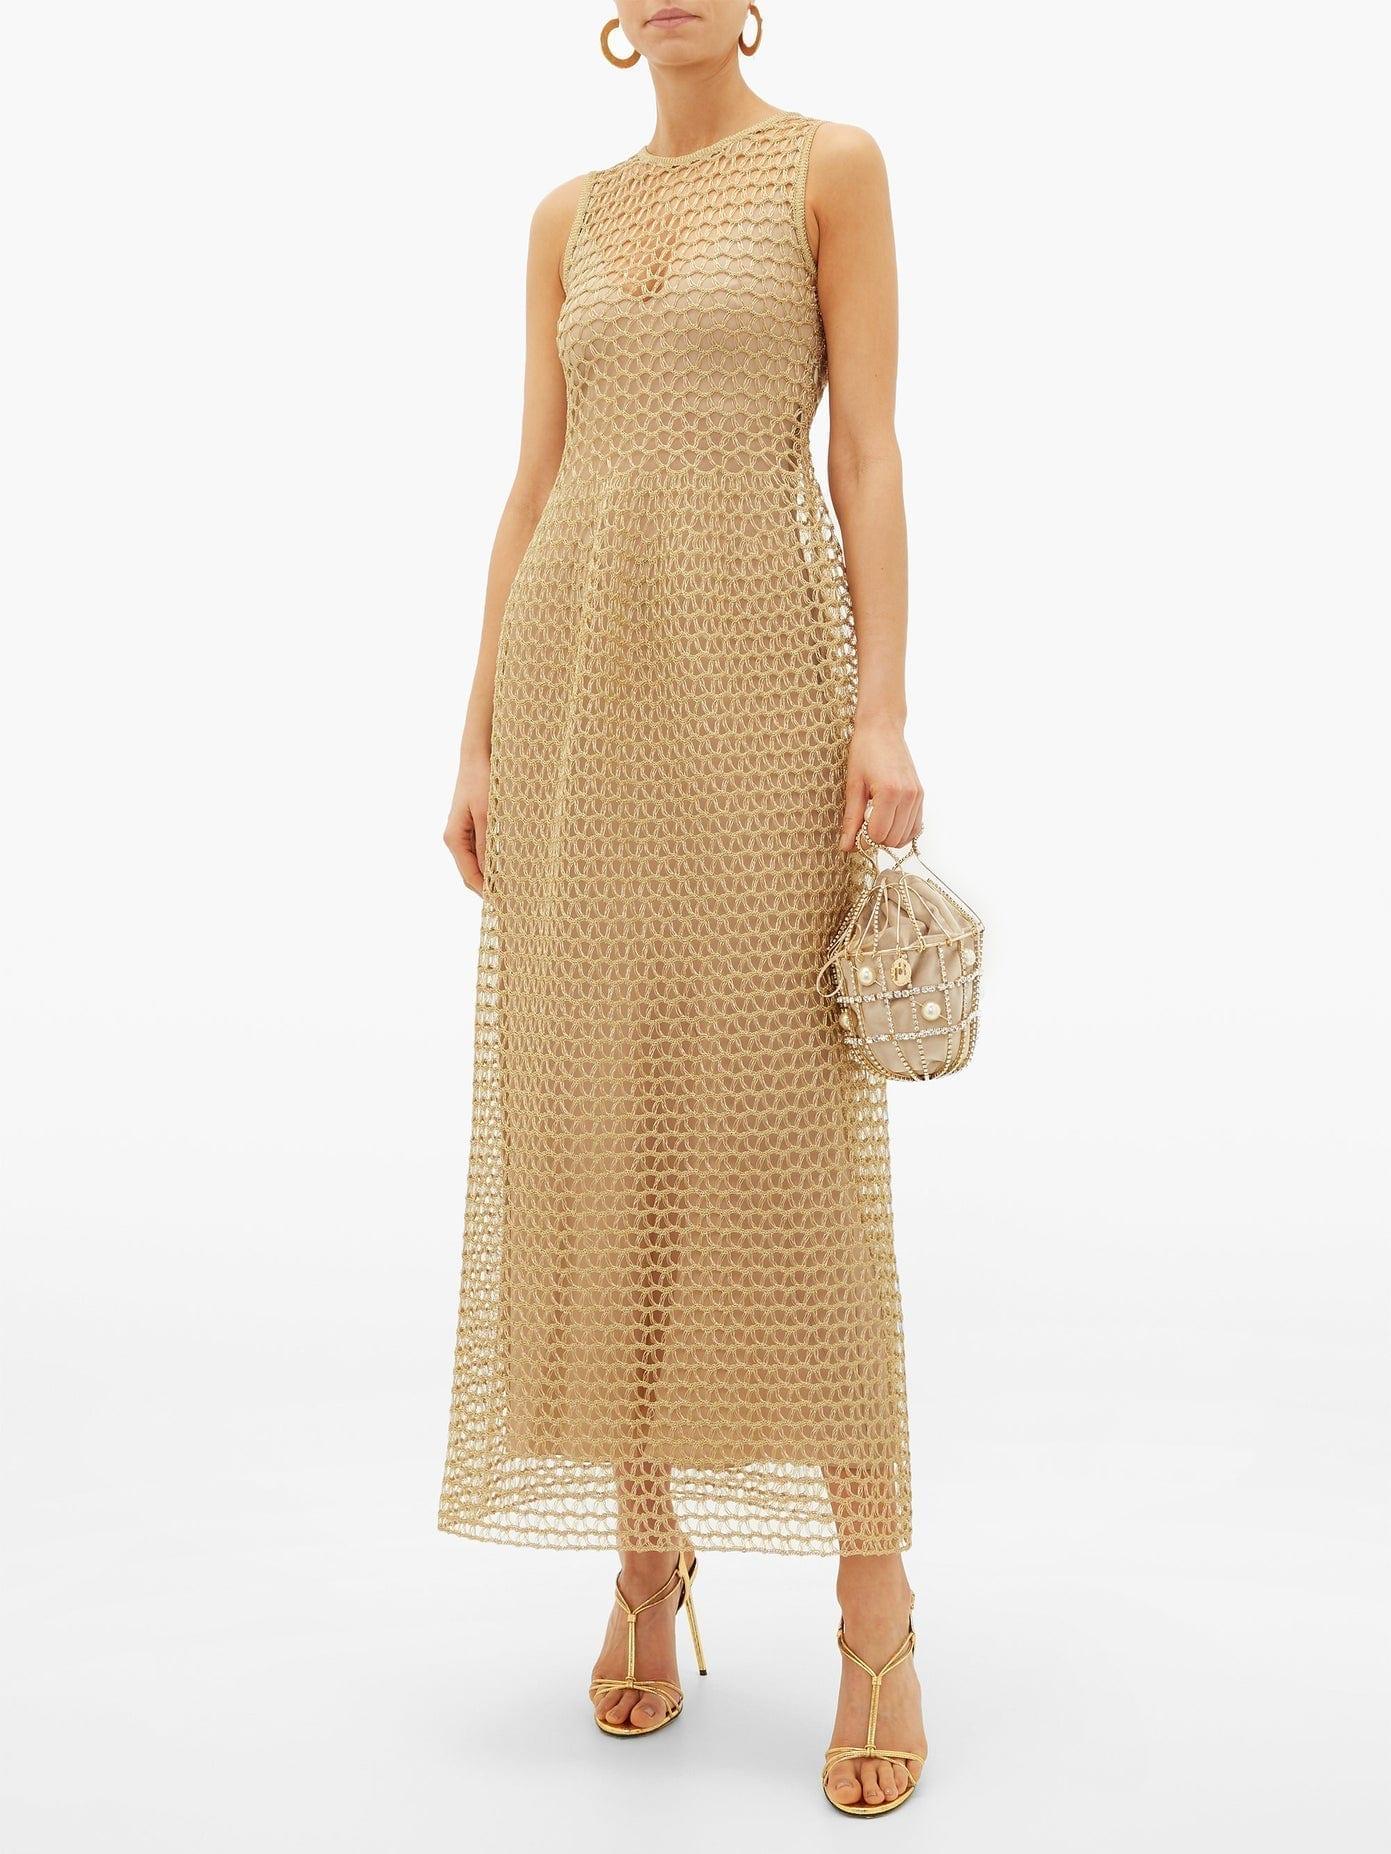 MAISON RABIH KAYROUZ Metallic Open-Knit Gown